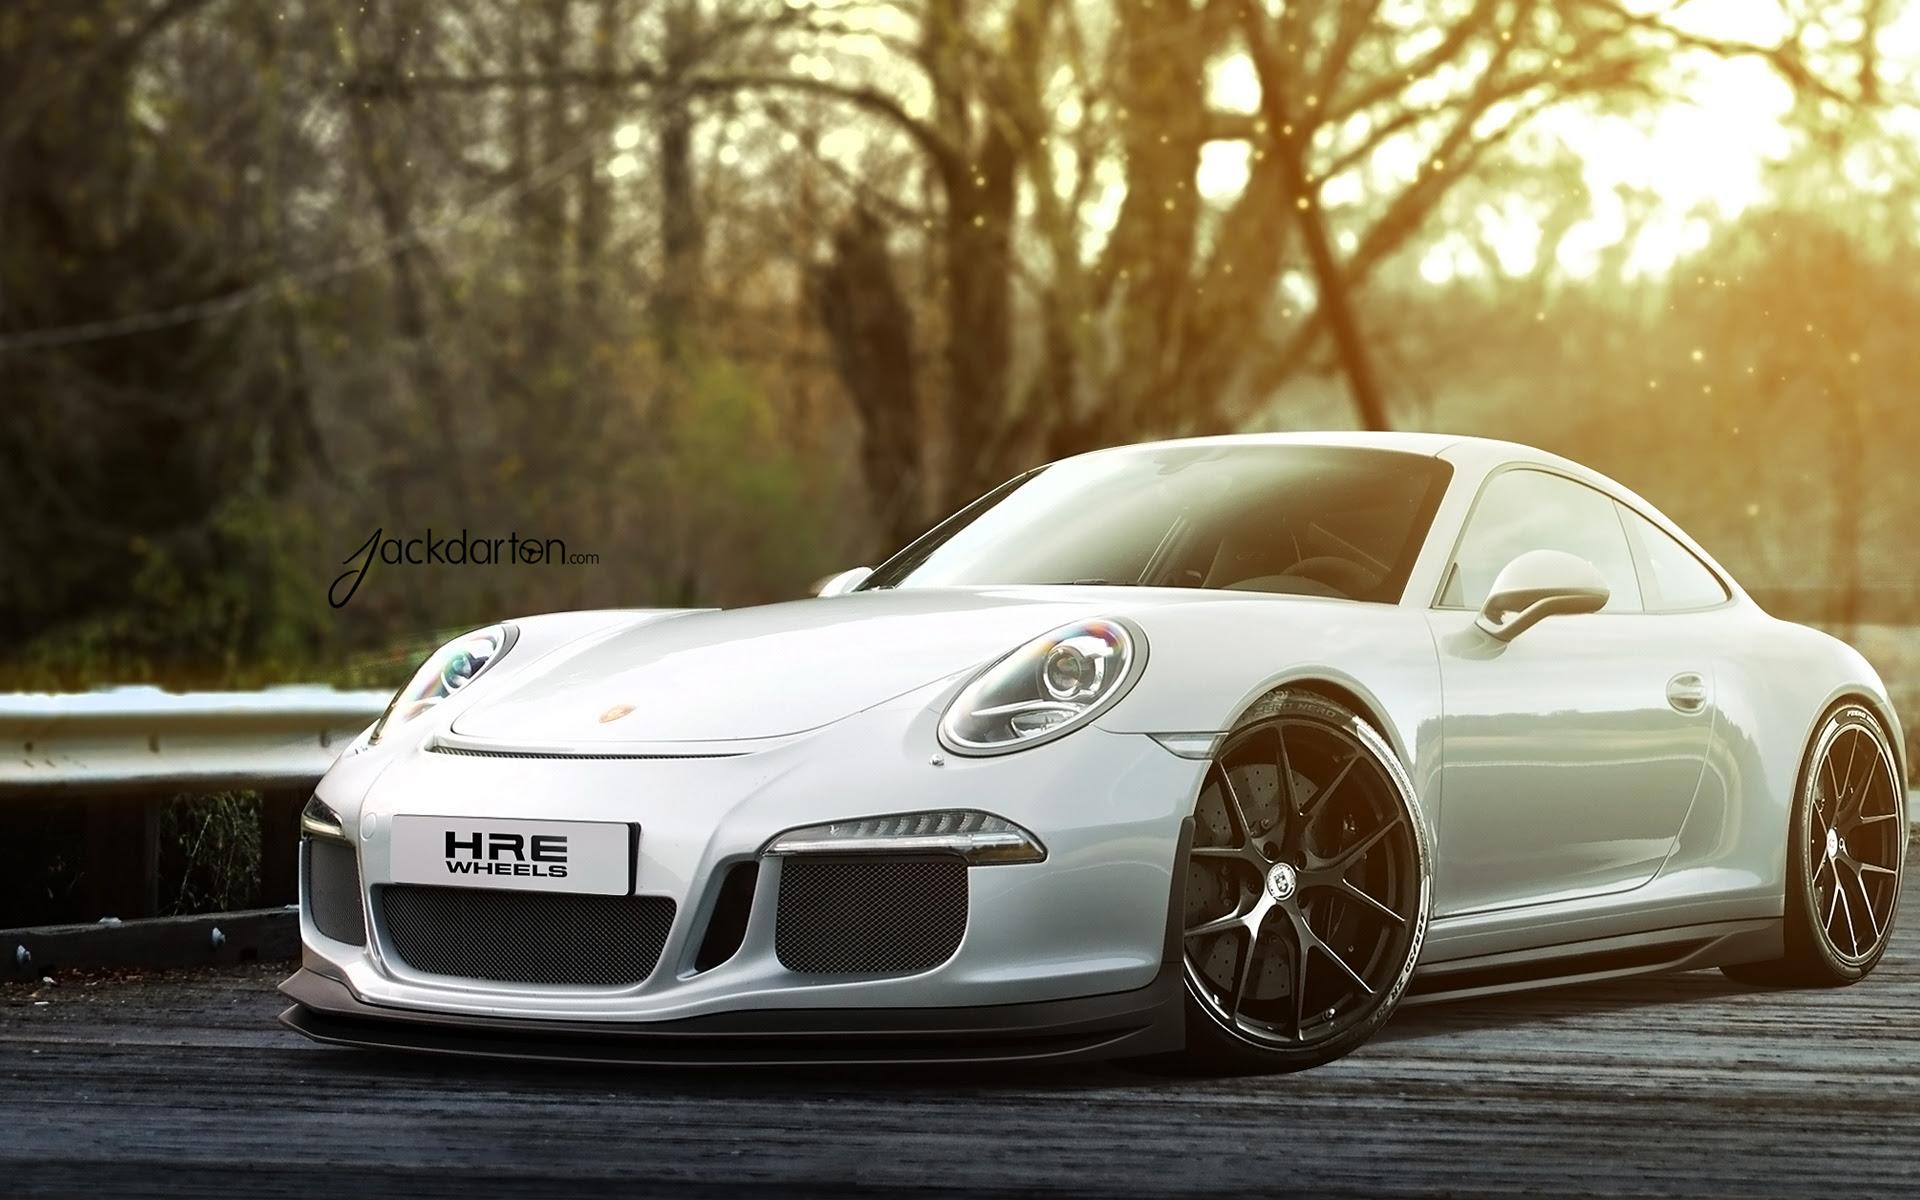 Porsche 911 Gt3 Wallpapers 20 Wallpapers Adorable Wallpapers